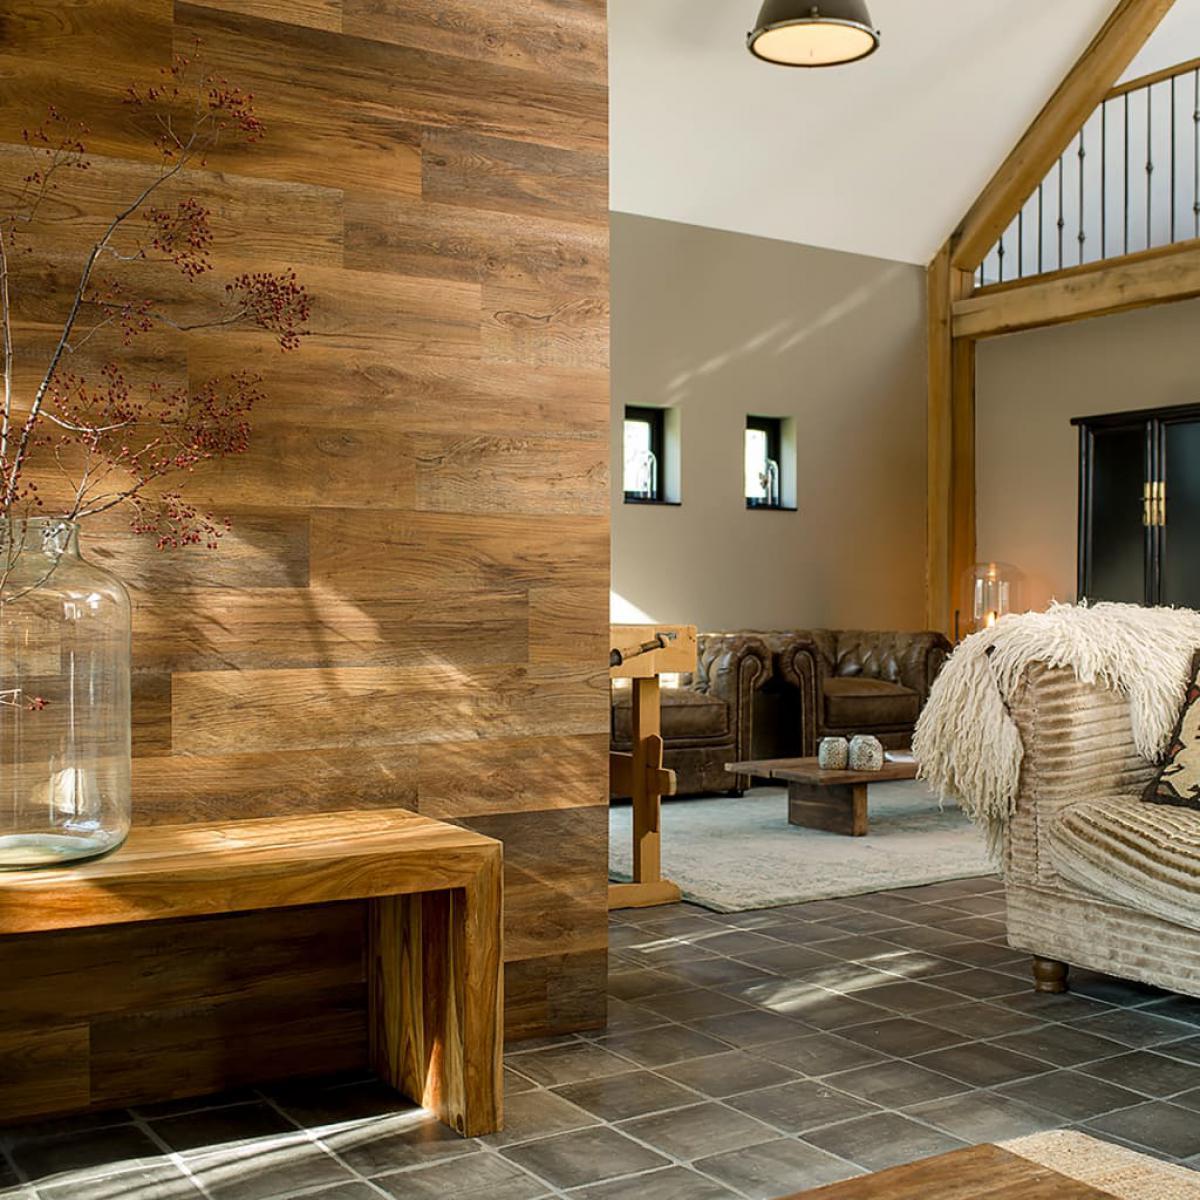 Wallart WallArt Planches d'aspect de bois Marron terre d'ombre